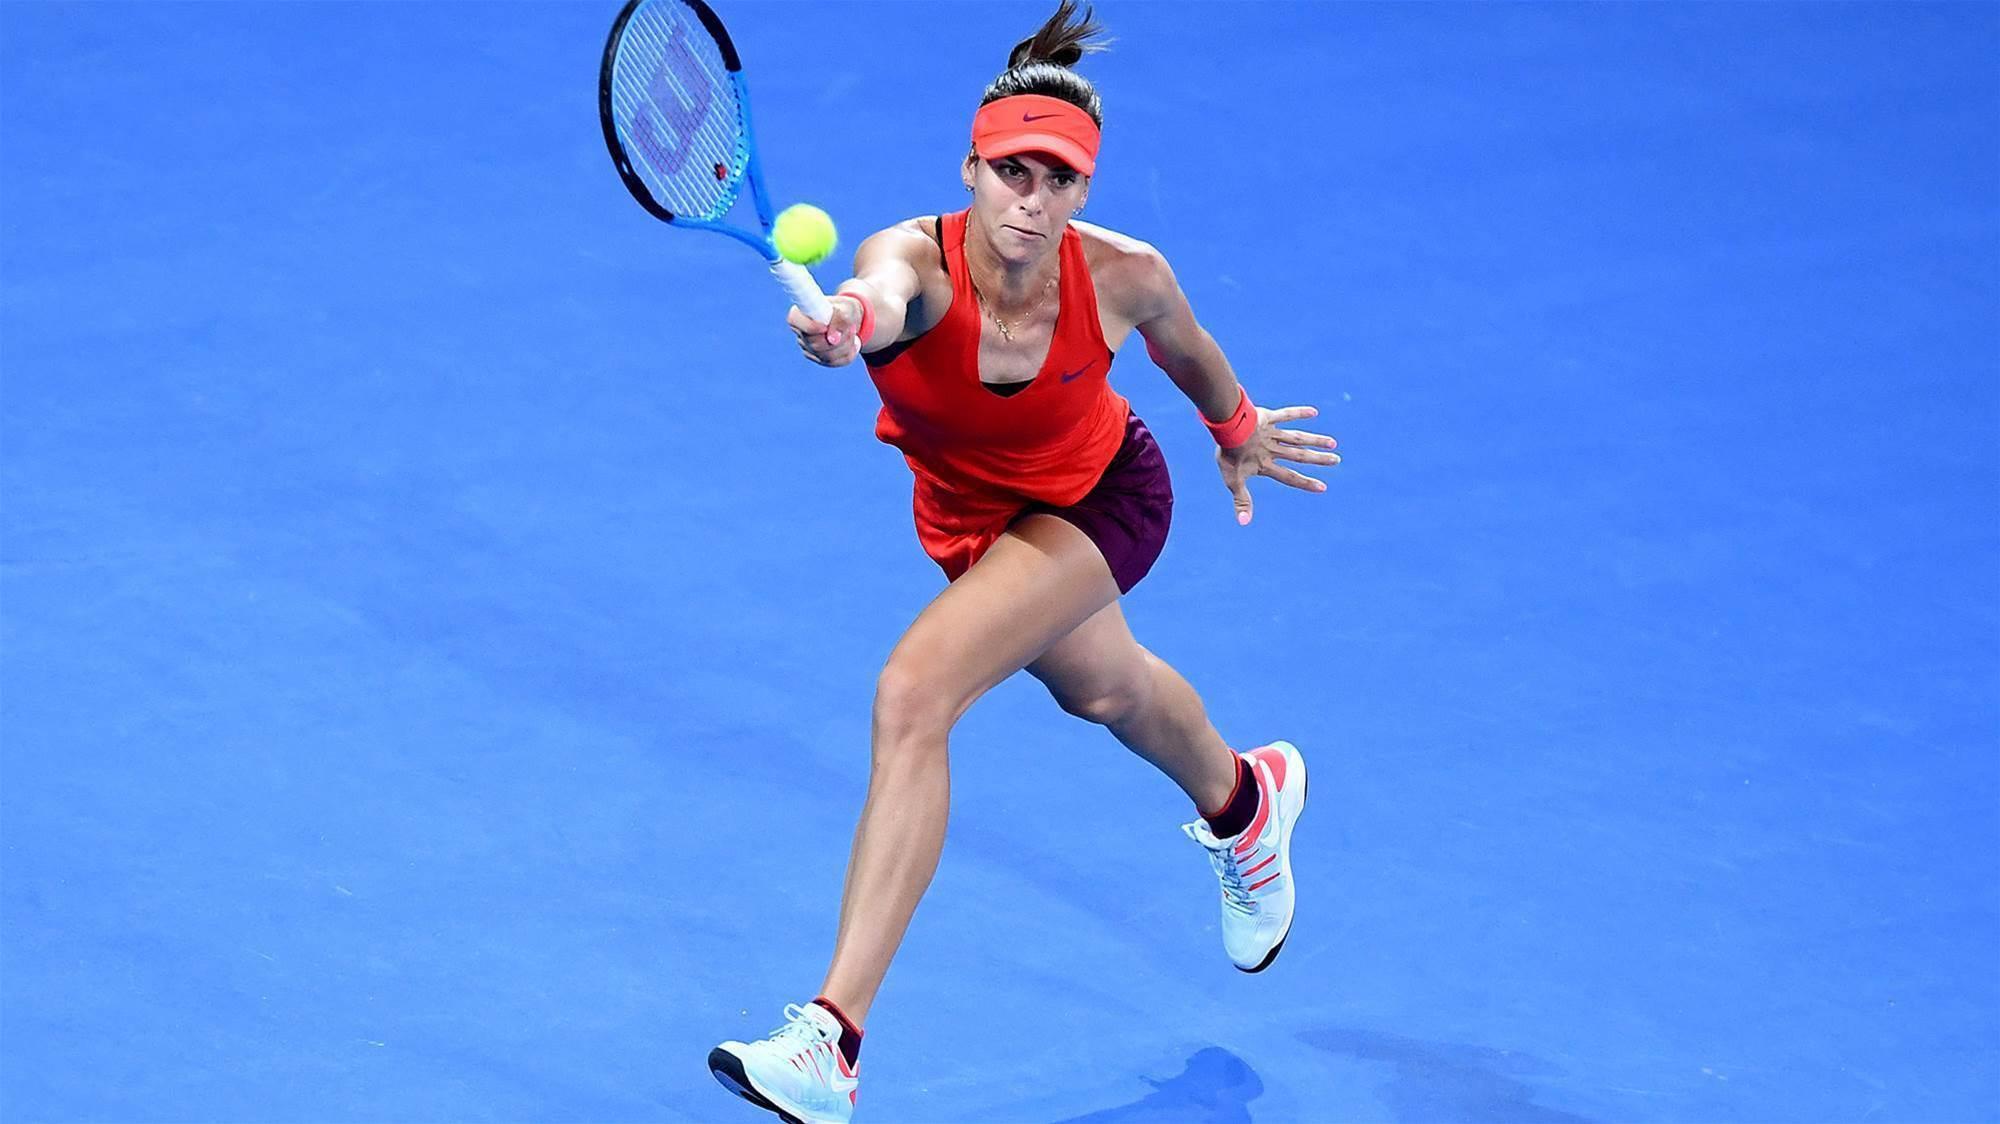 Pliskova ends Tomljanovic's Brisbane run